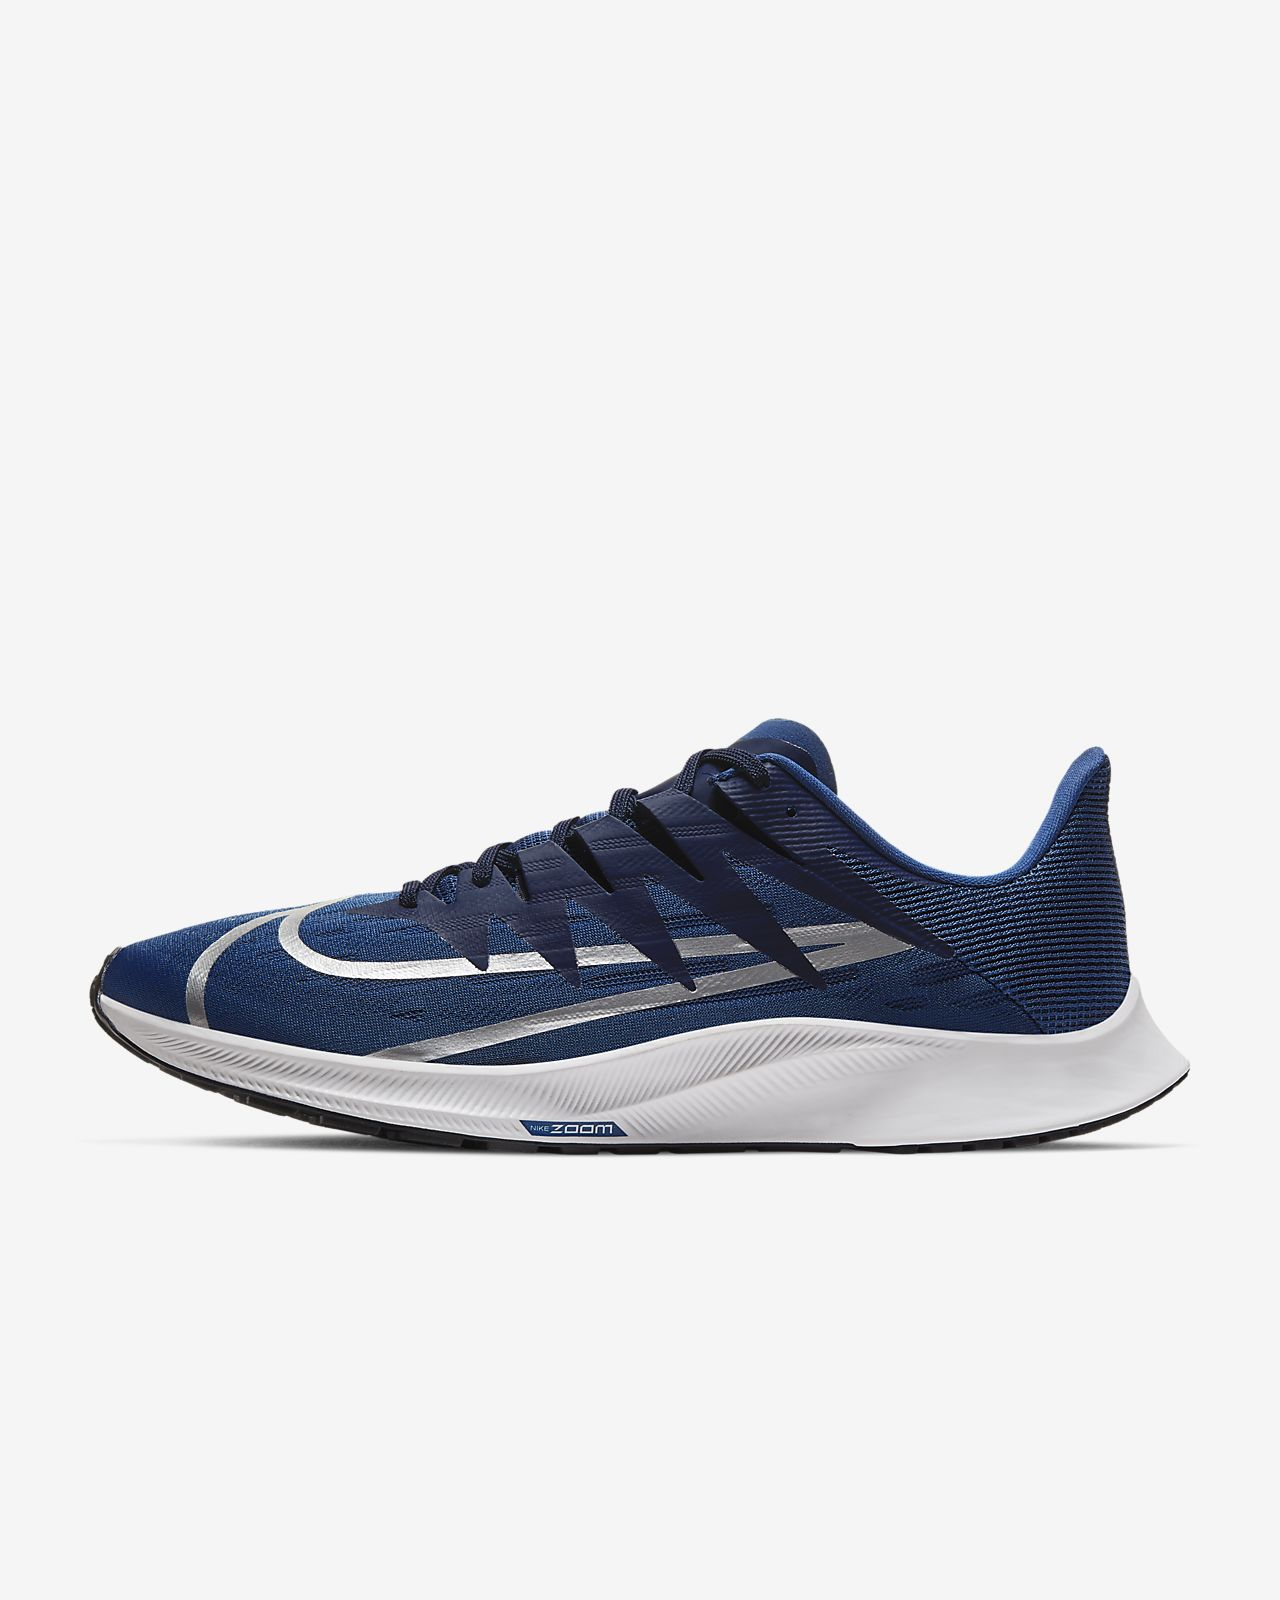 Nike Zoom Rival Fly Men's Running Shoe